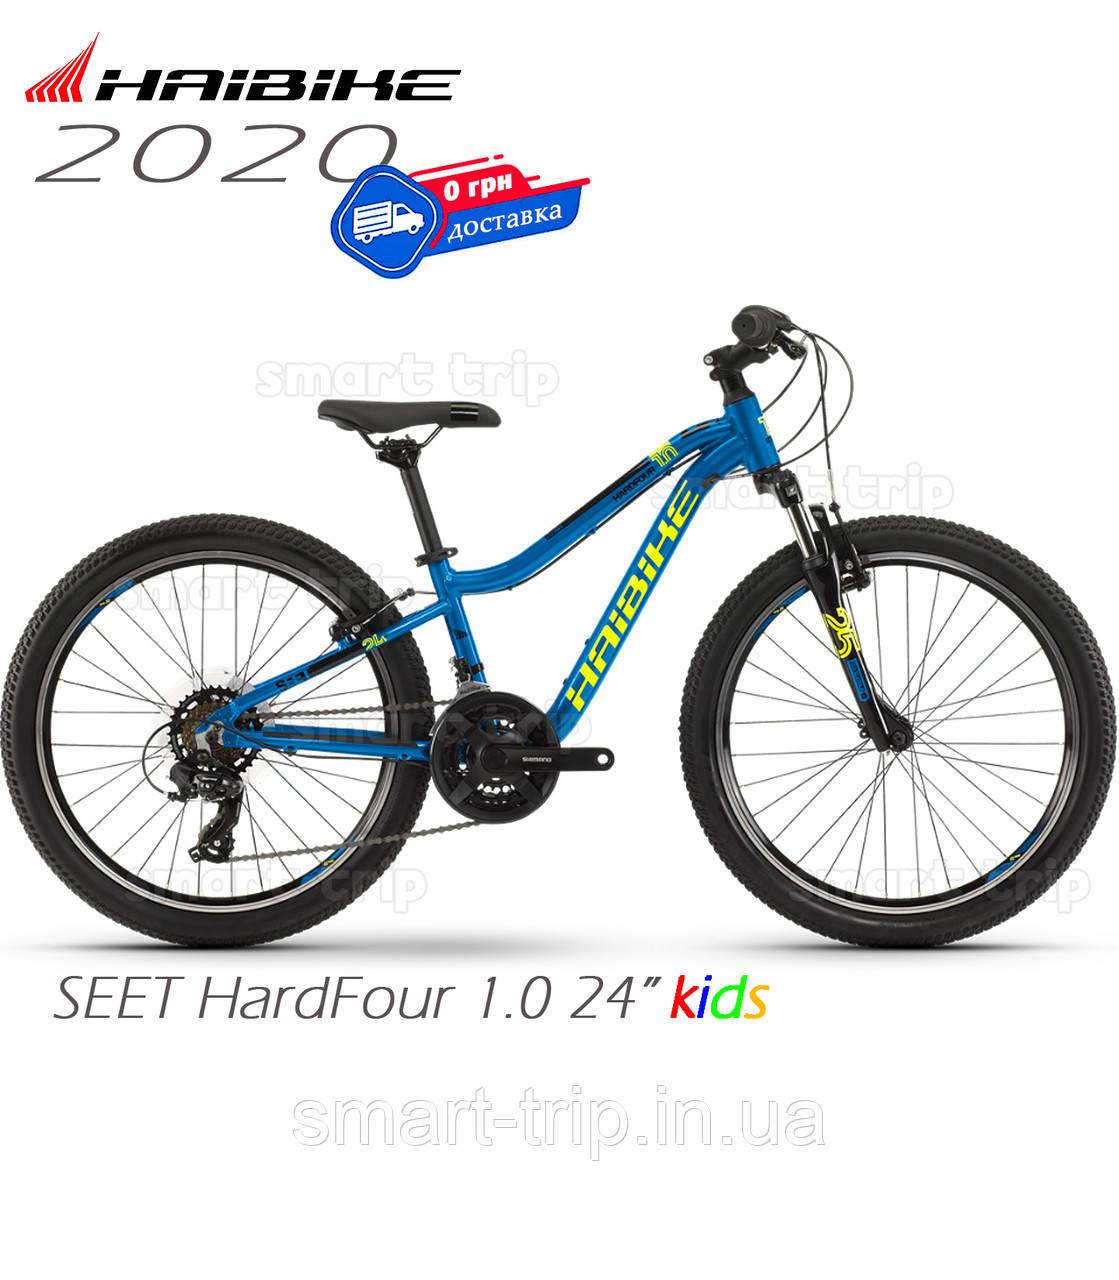 Велосипед 24 HAIBIKE SEET HardFour 1.0 рост 135-150см синий 2020 детский (4100030930)